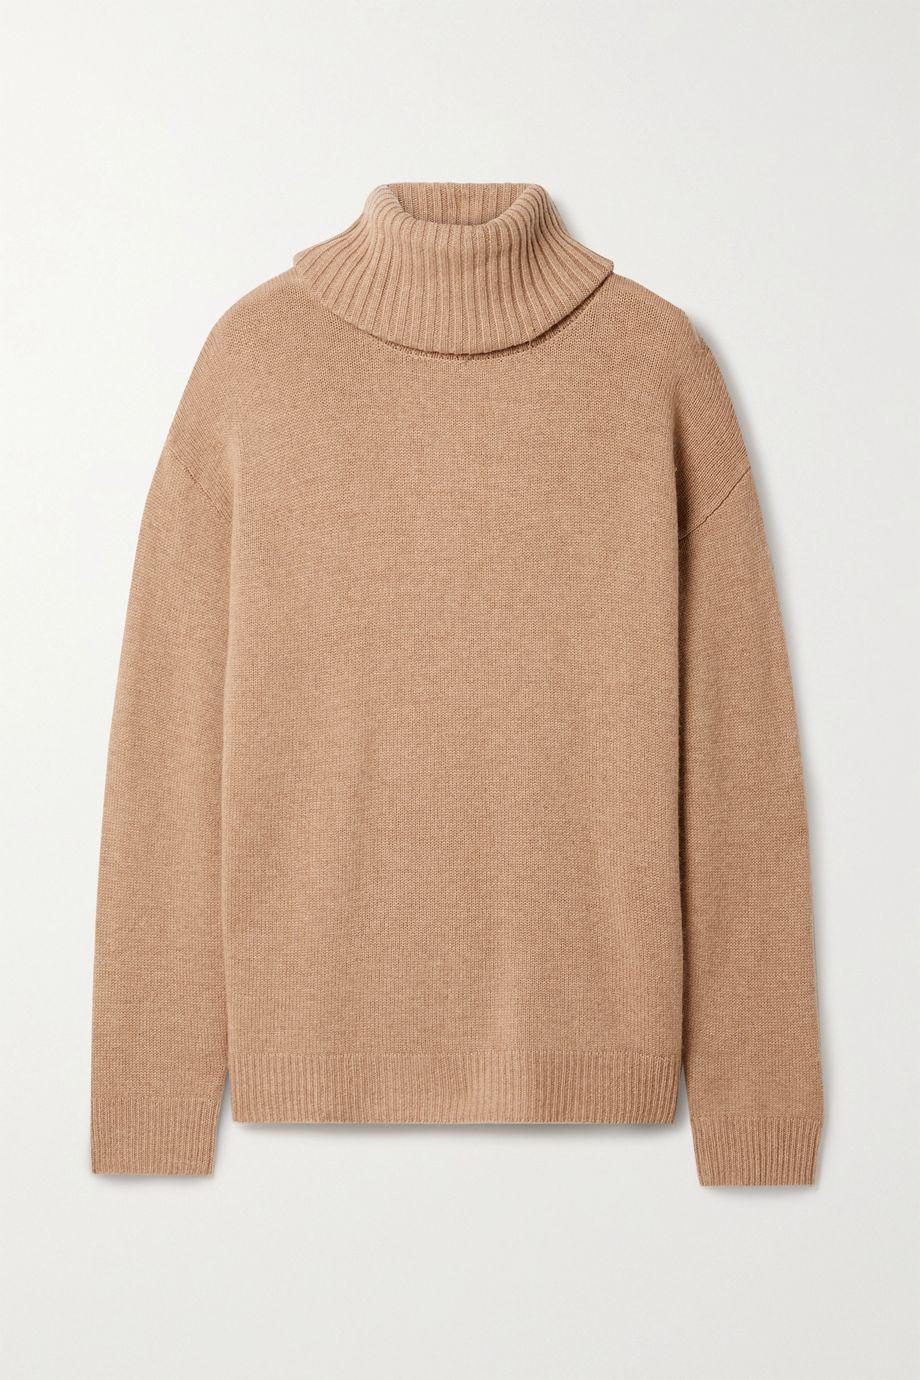 Holzweiler Hovin wool and cashmere-blend turtleneck sweater